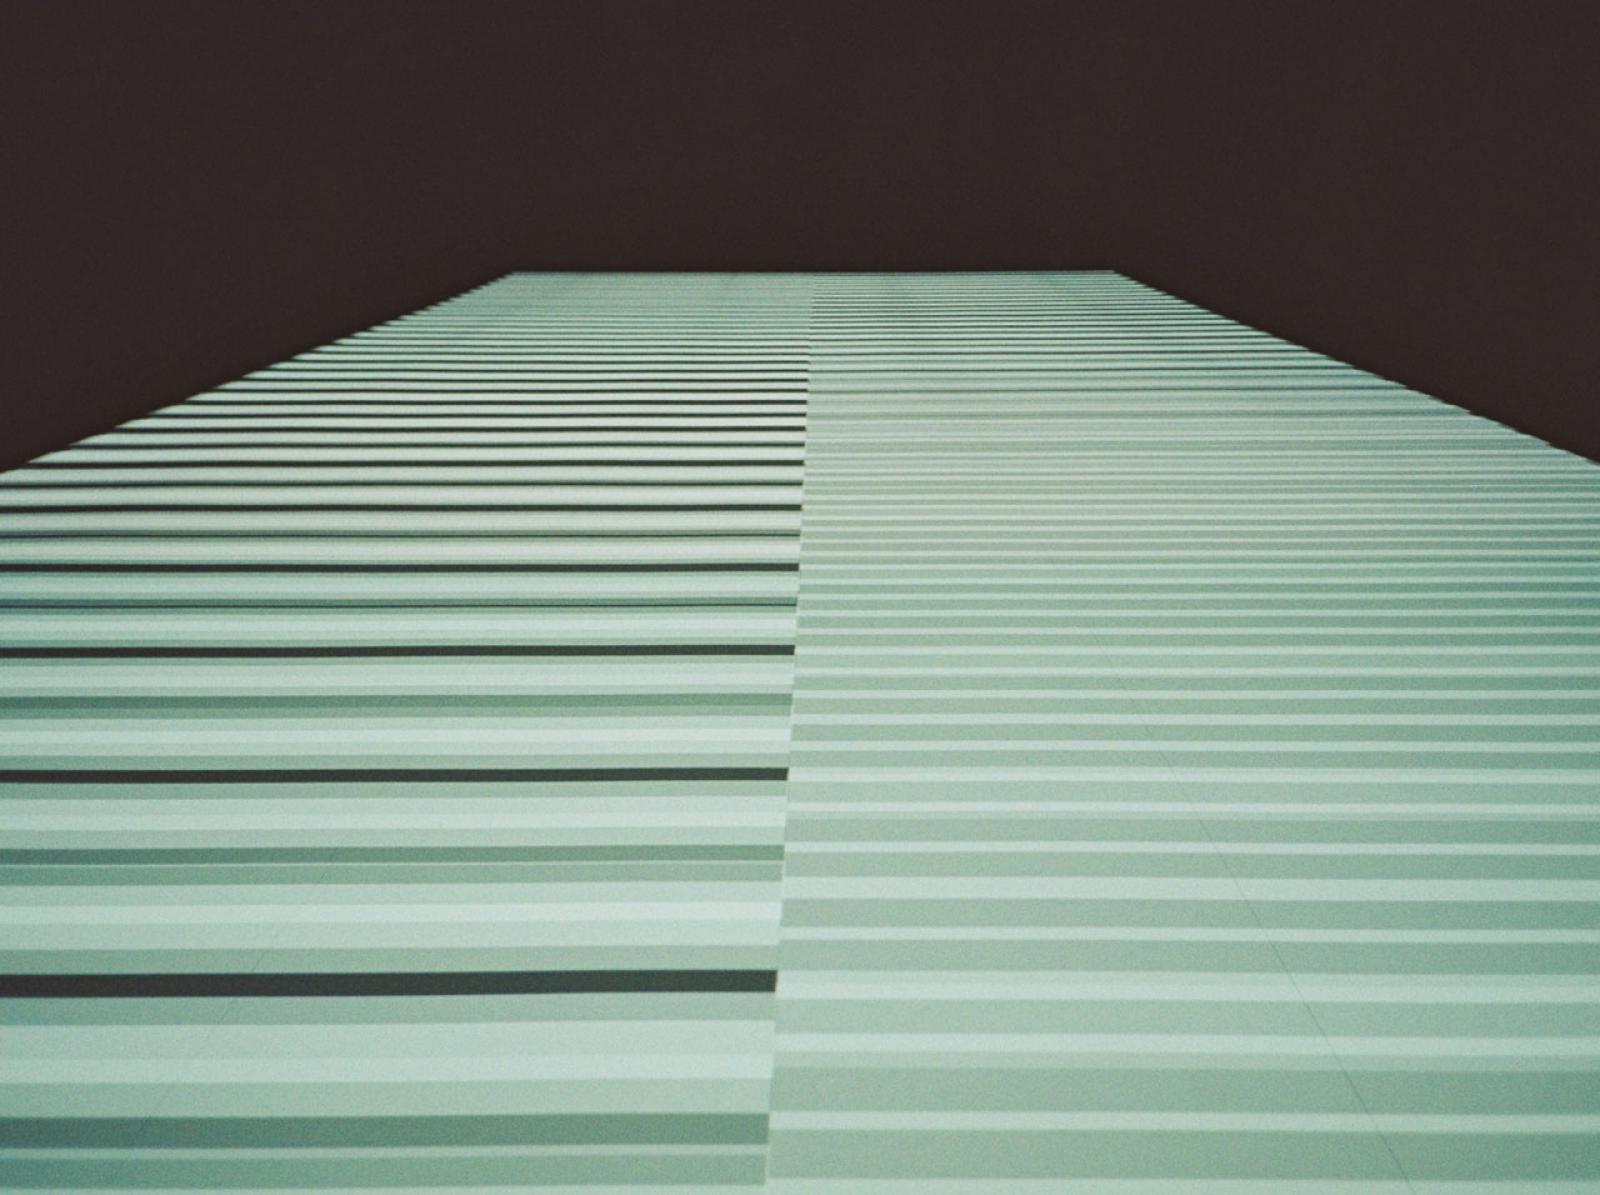 Ryoji Ikeda /test pattern [nº11], 2017/  Computer graphics, programming: Tomonaga Tokuyama